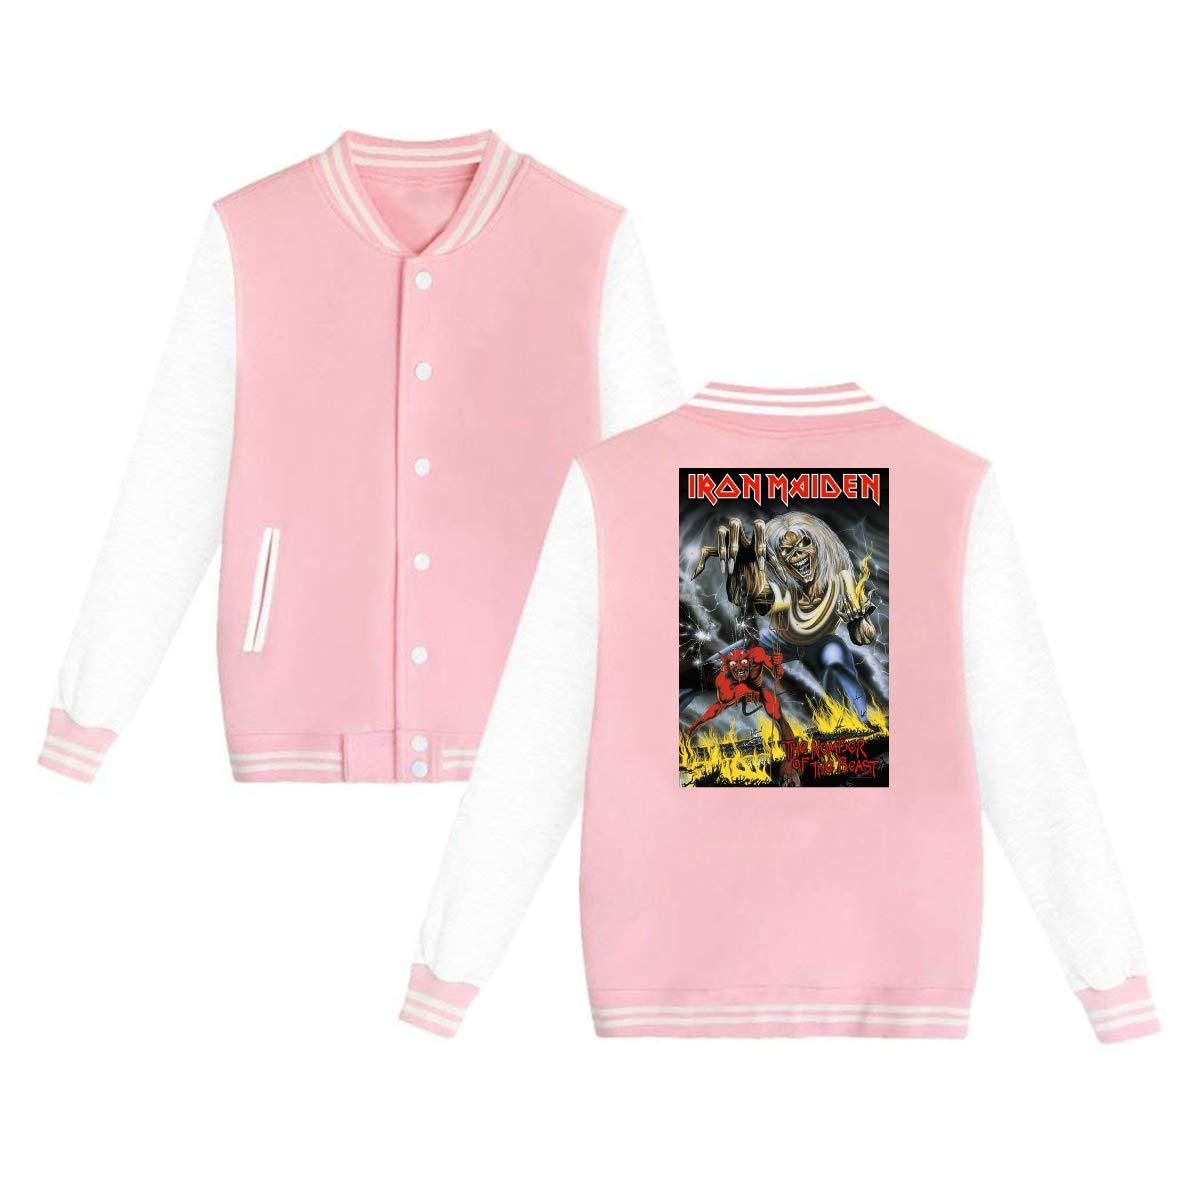 6cb3314a Pink Unisex Women's Varsity Baseball Uniform Jacket Jacket Jacket Iron  Maiden The Number Of The Beast Sport Coat Winter Sweatshirt Velvet 4acf84